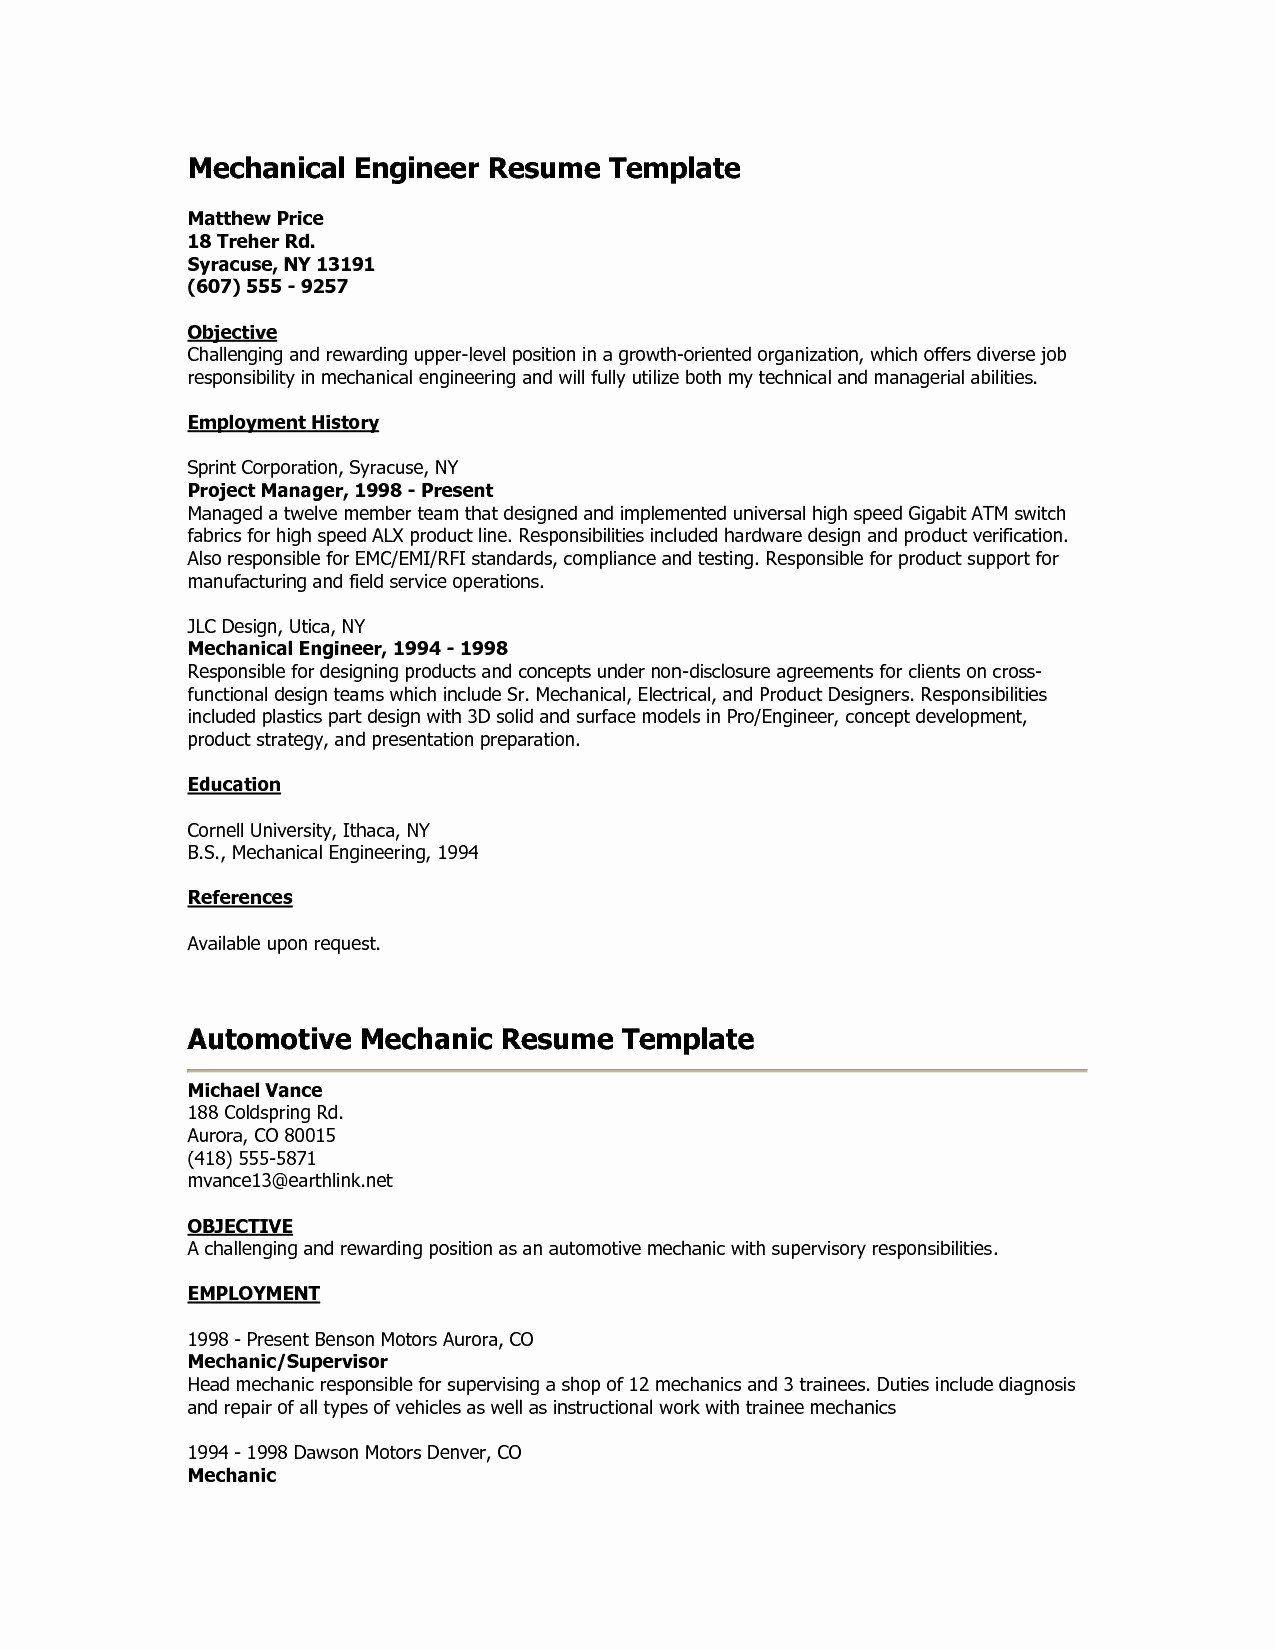 Bank Teller Resume No Experience Printable Resume Template Mechanical Engineer Resume Engineering Resume Bank Teller Resume